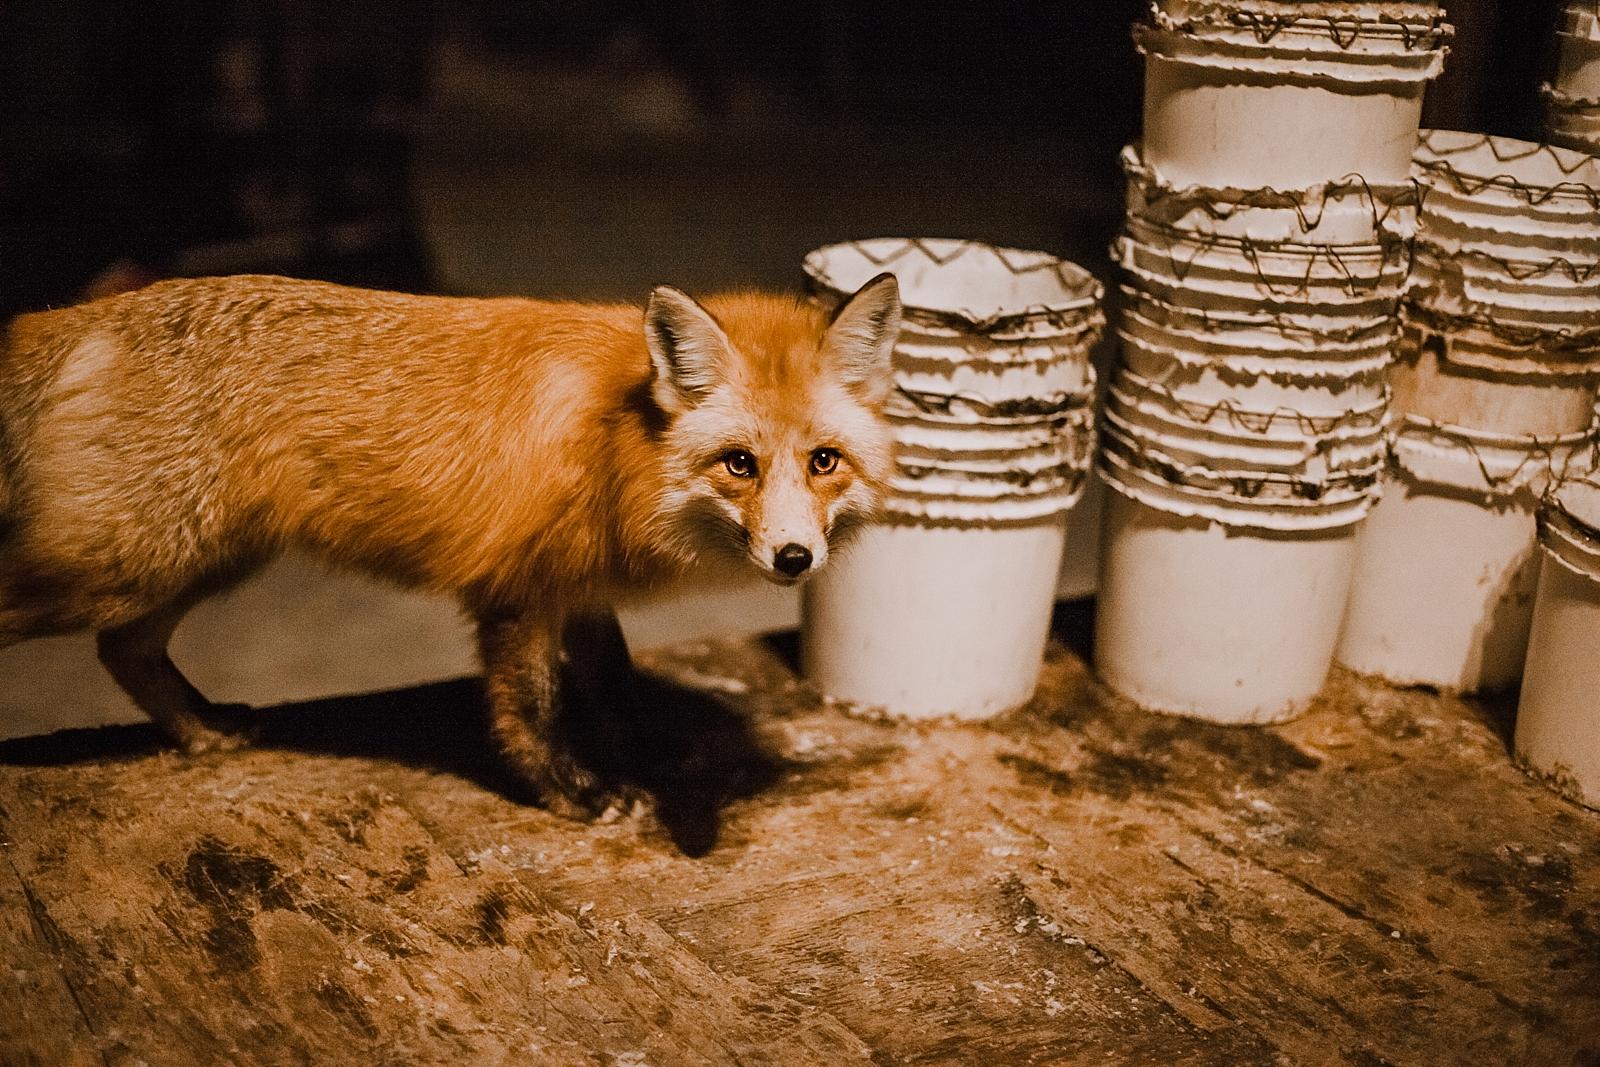 fox hunting, colorado elopement photographer, breckenridge elopement photographer, copper colorado elopement photographer, leadville colorado elopement photographer